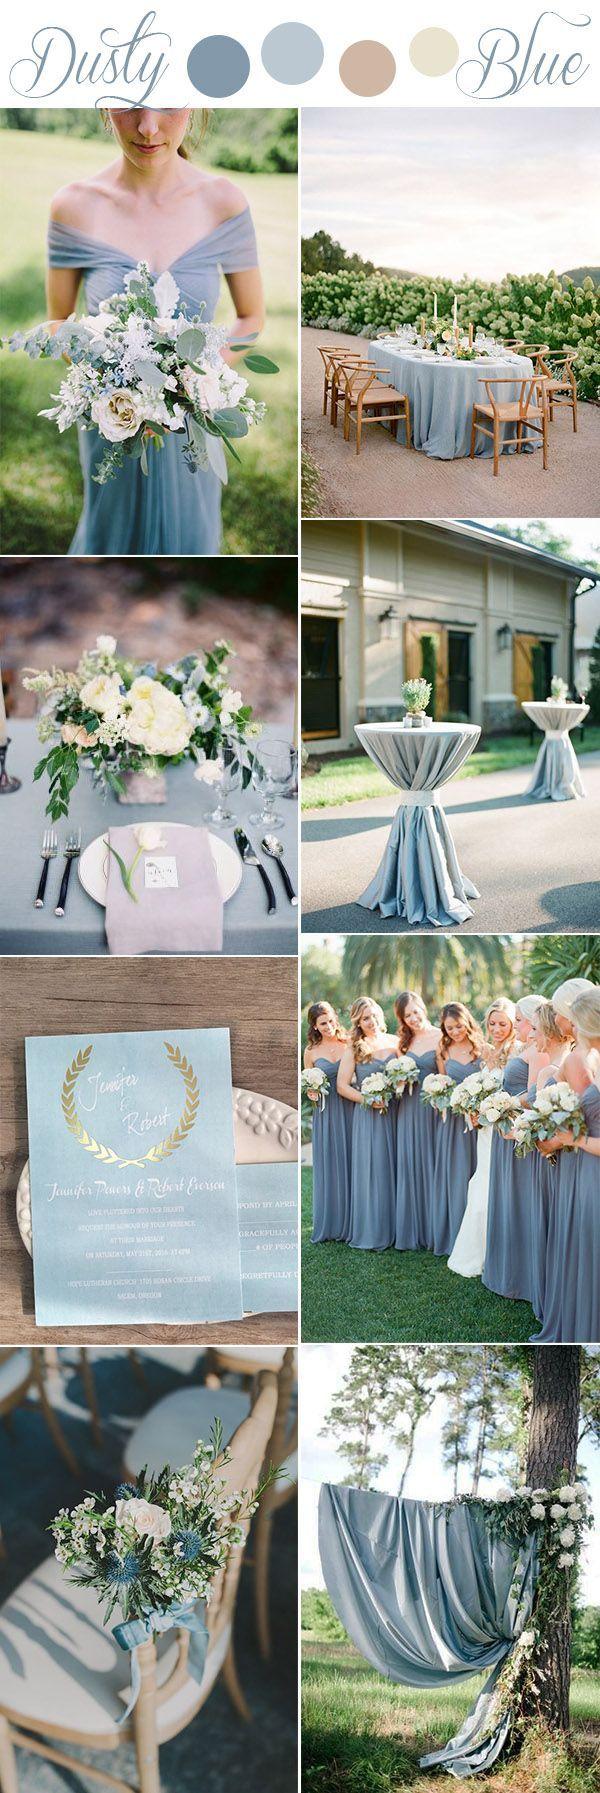 Romantic Softest Dusty Blue Rustic Wedding Color Ideas Rustic Wedding Colors Rustic Wedding Blue Wedding Colors